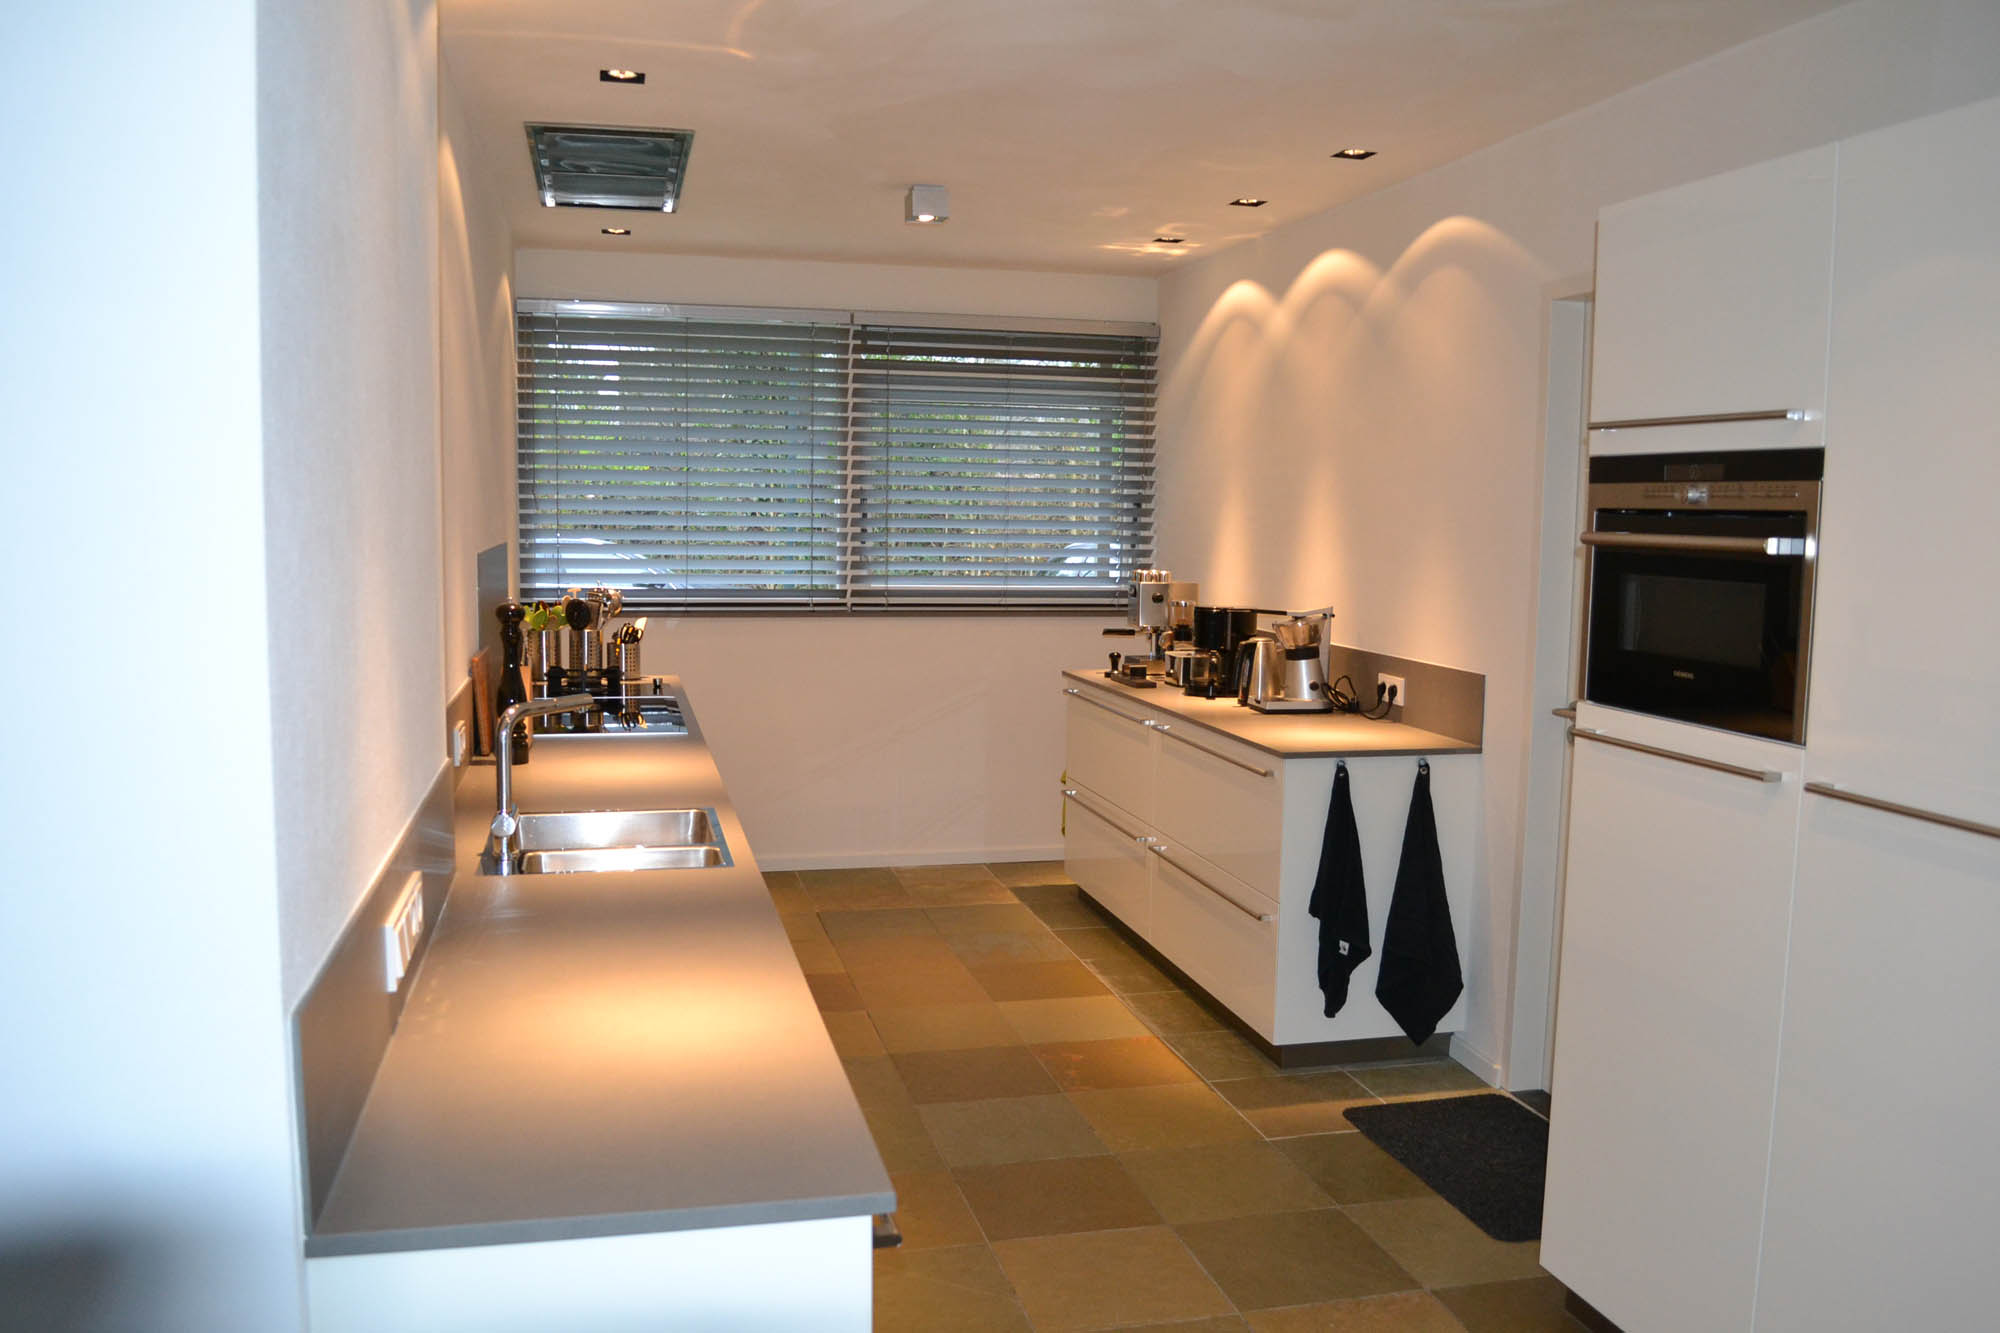 Hoogglans Wit Keuken : Keuken hoogglans wit met keramiek blad pdi interieurbouw